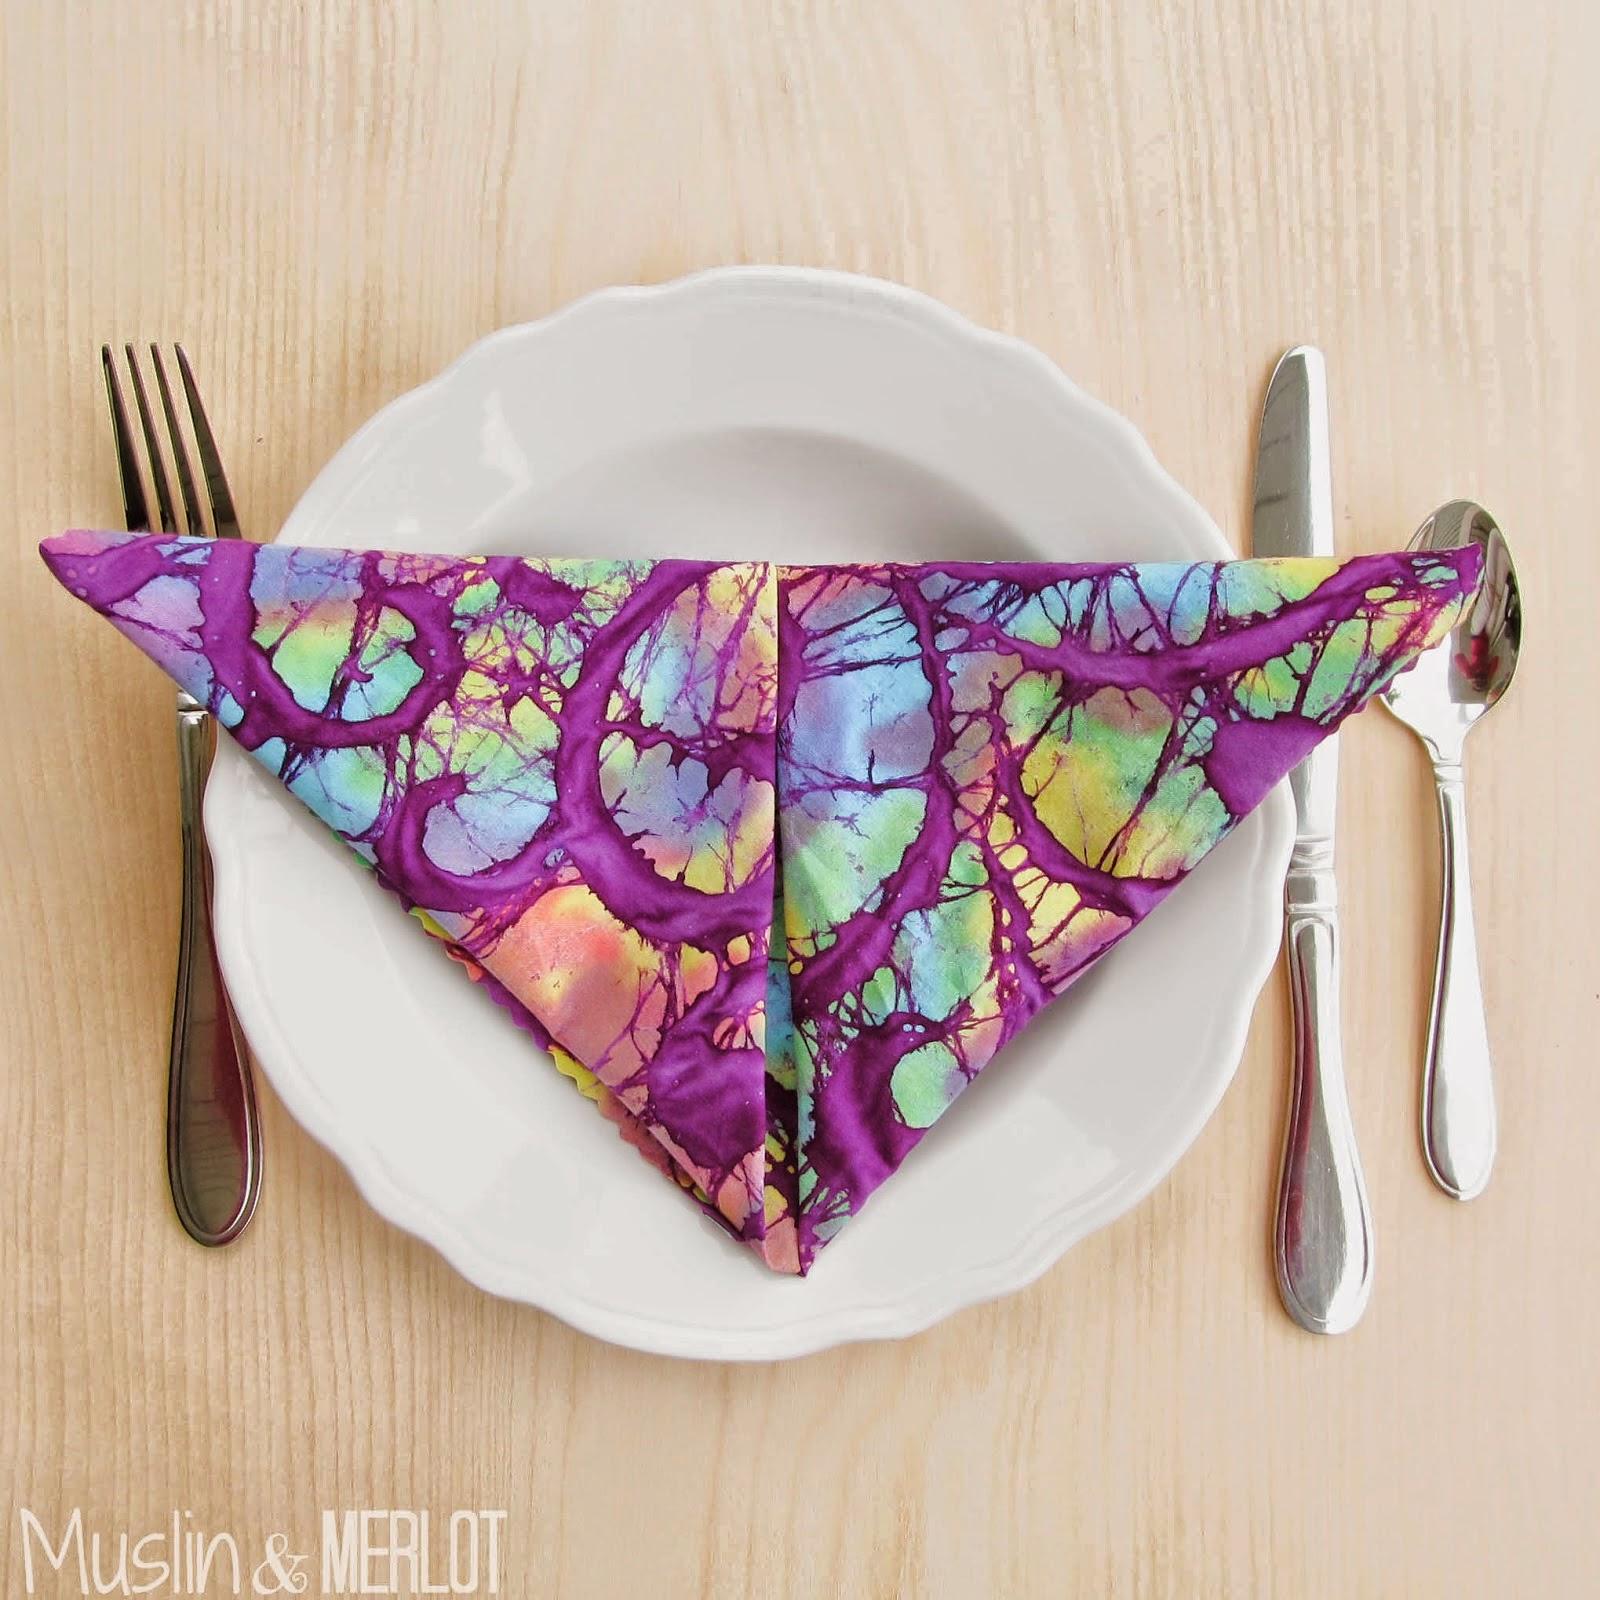 http://muslinandmerlot.blogspot.com/2014/07/how-to-make-no-sew-table-napkins.html